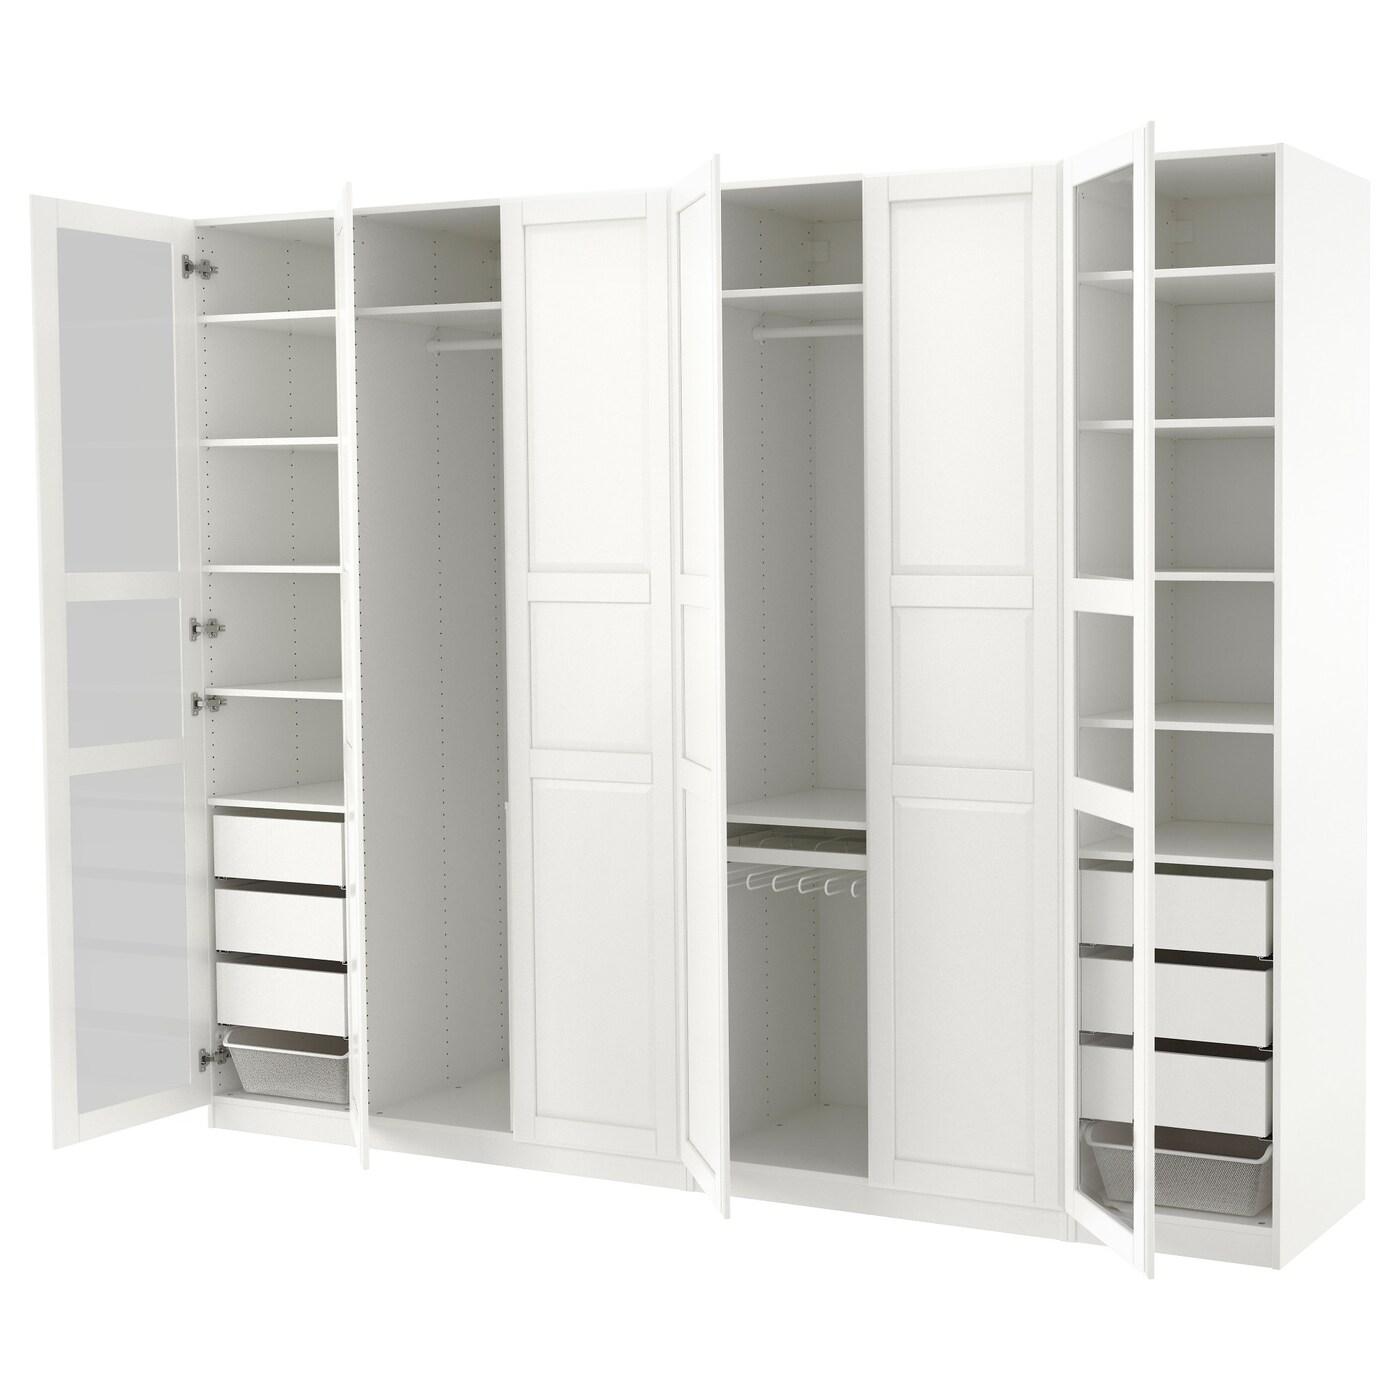 PAX Wardrobe White tyssedal/tyssedal glass 300x60x236 cm ...